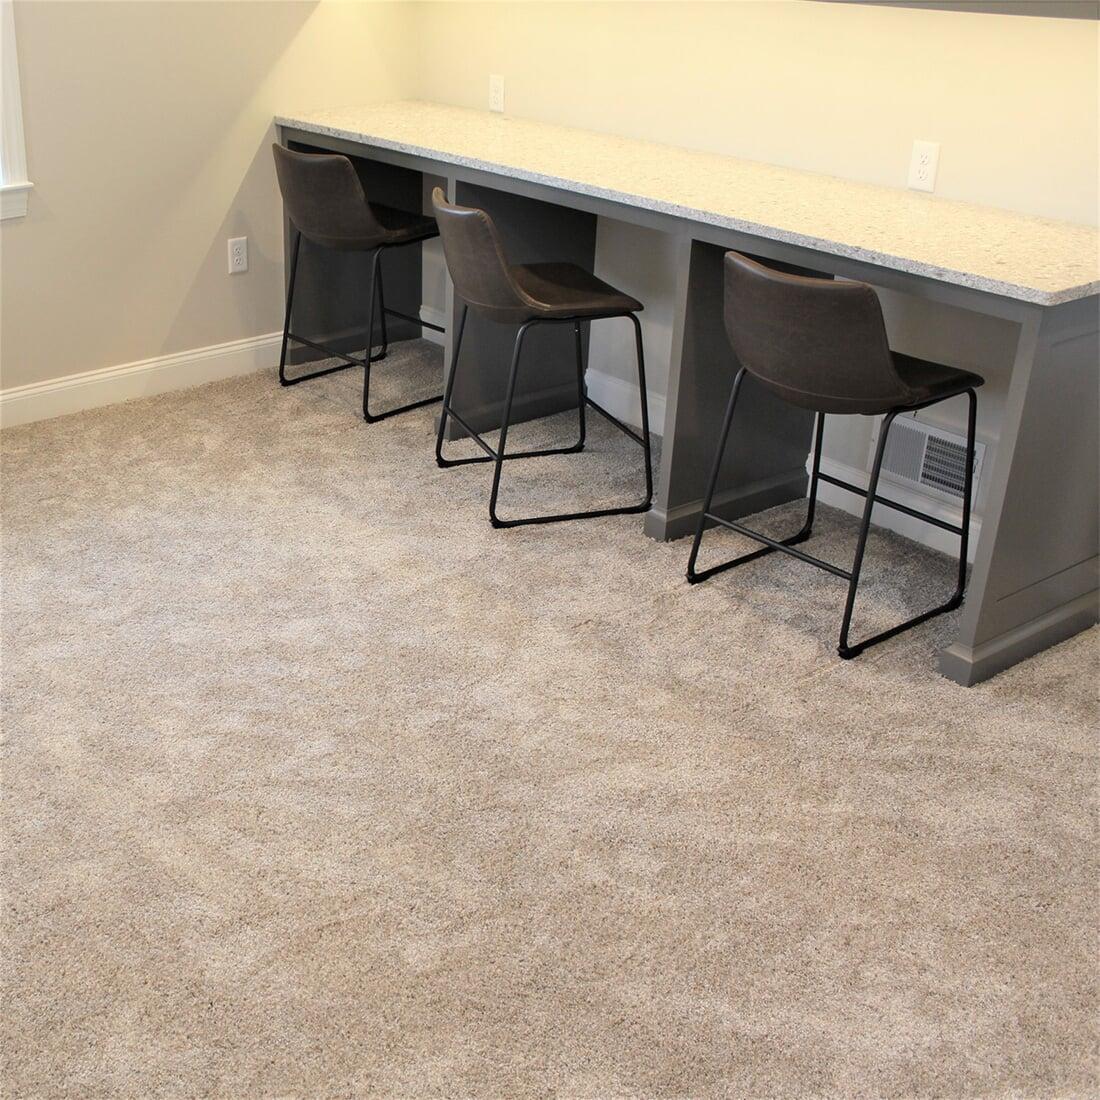 Carpet flooring in Lebanon, PA from Nolt's Floor Covering, Inc.